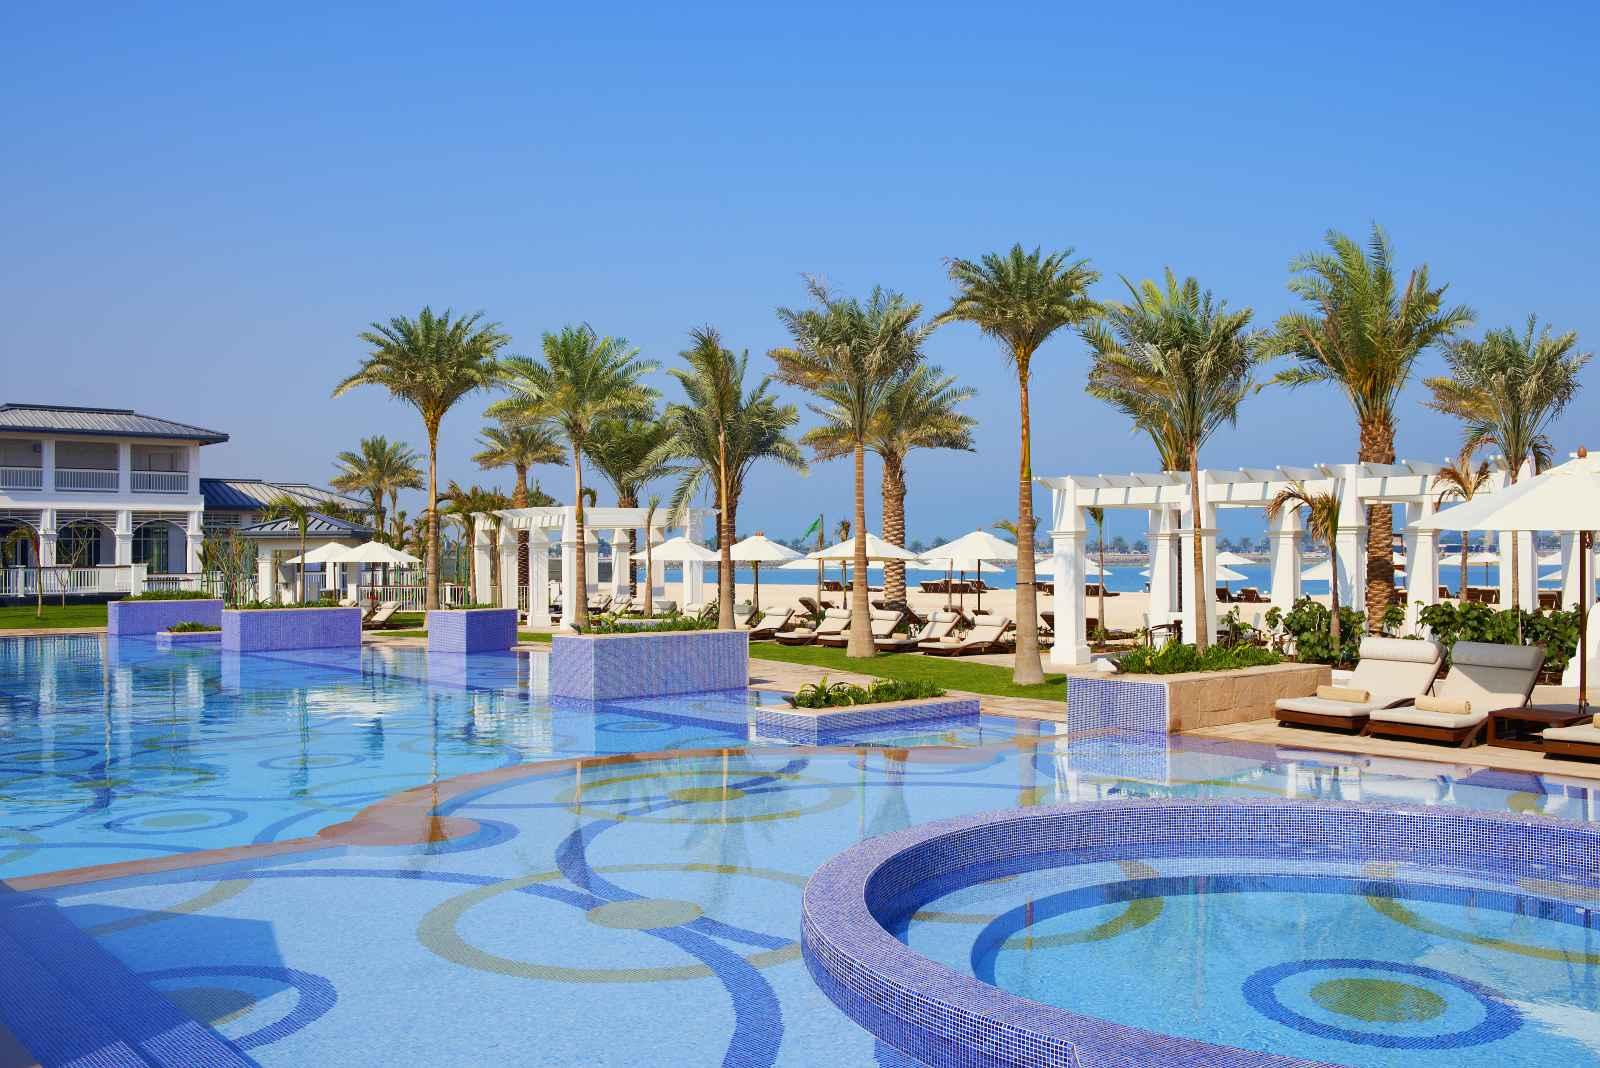 Abou Dhabi : The St. Regis Abu Dhabi